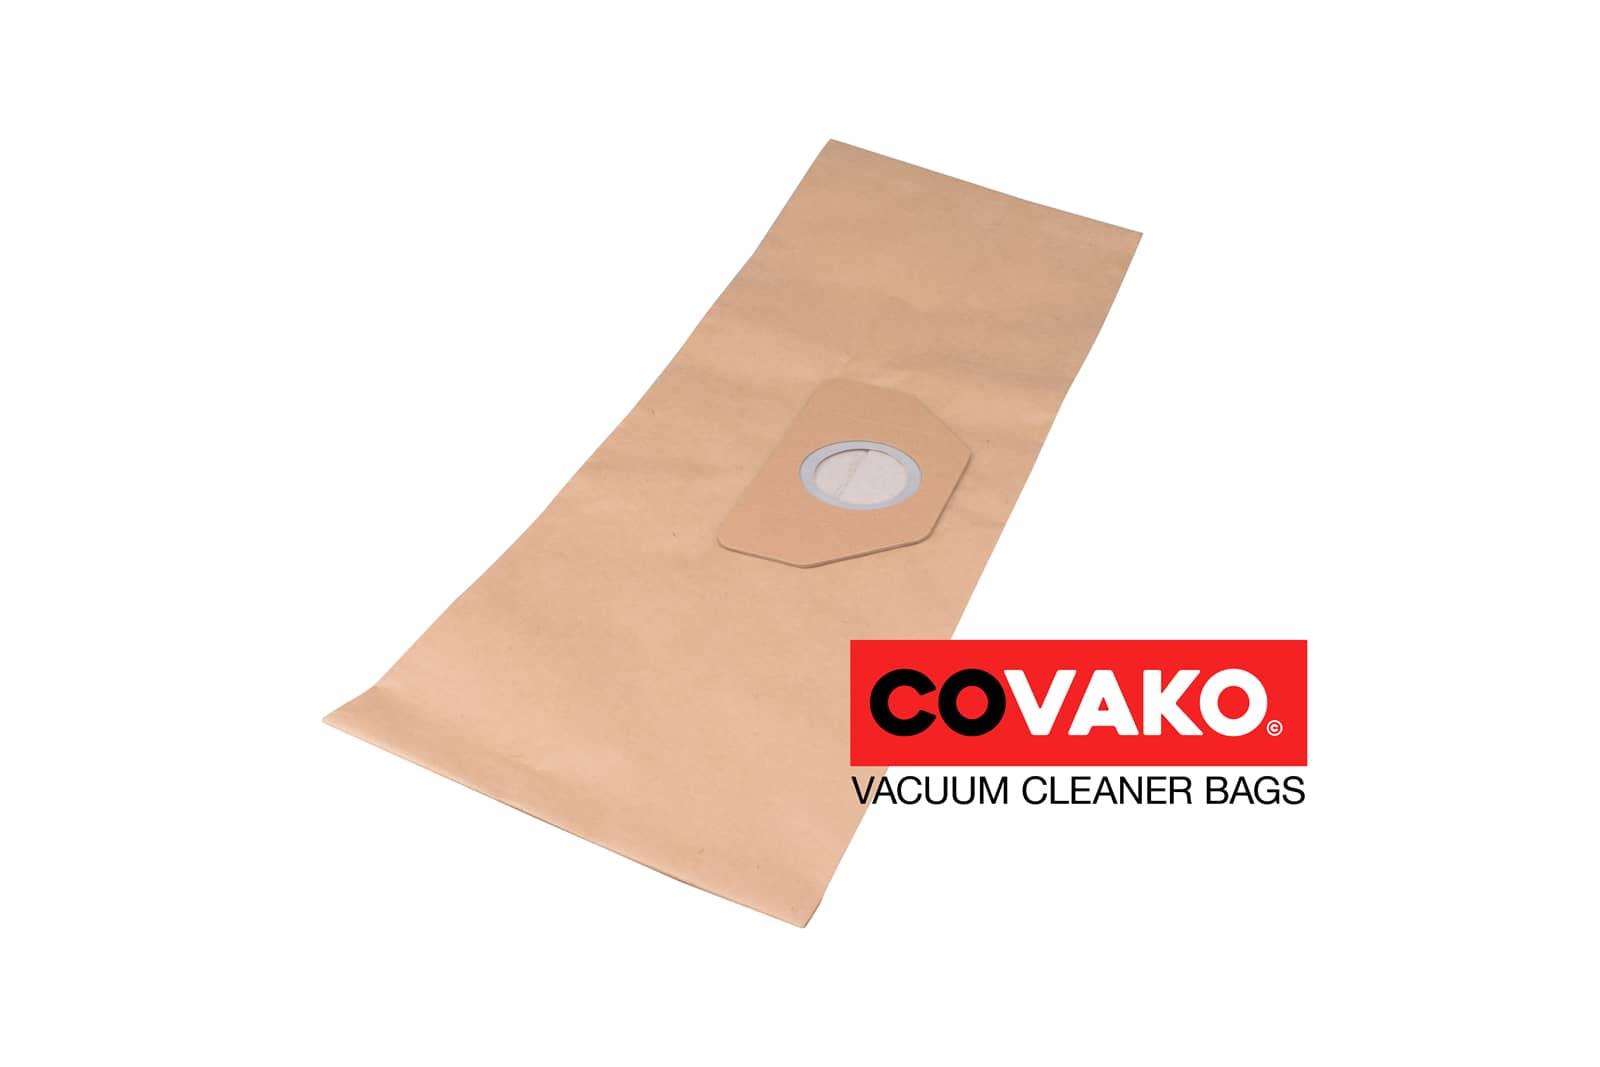 Kärcher A 2200 / Paper - Kärcher vacuum cleaner bags